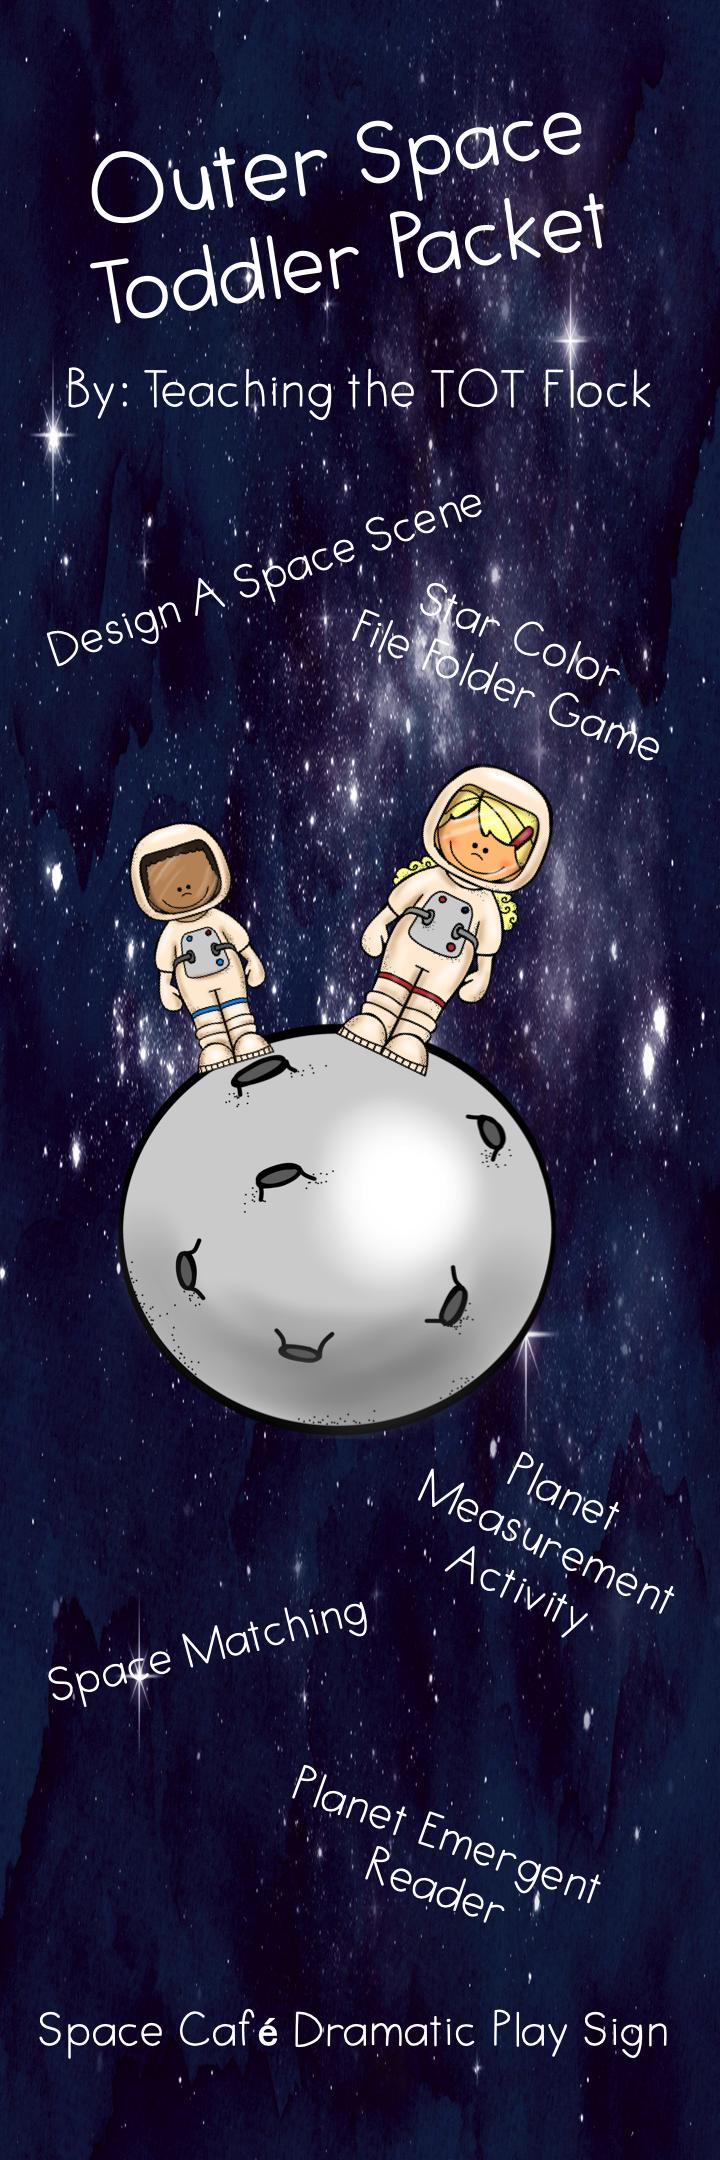 Space Toddler Packet in 2020 Toddler teacher, Teaching